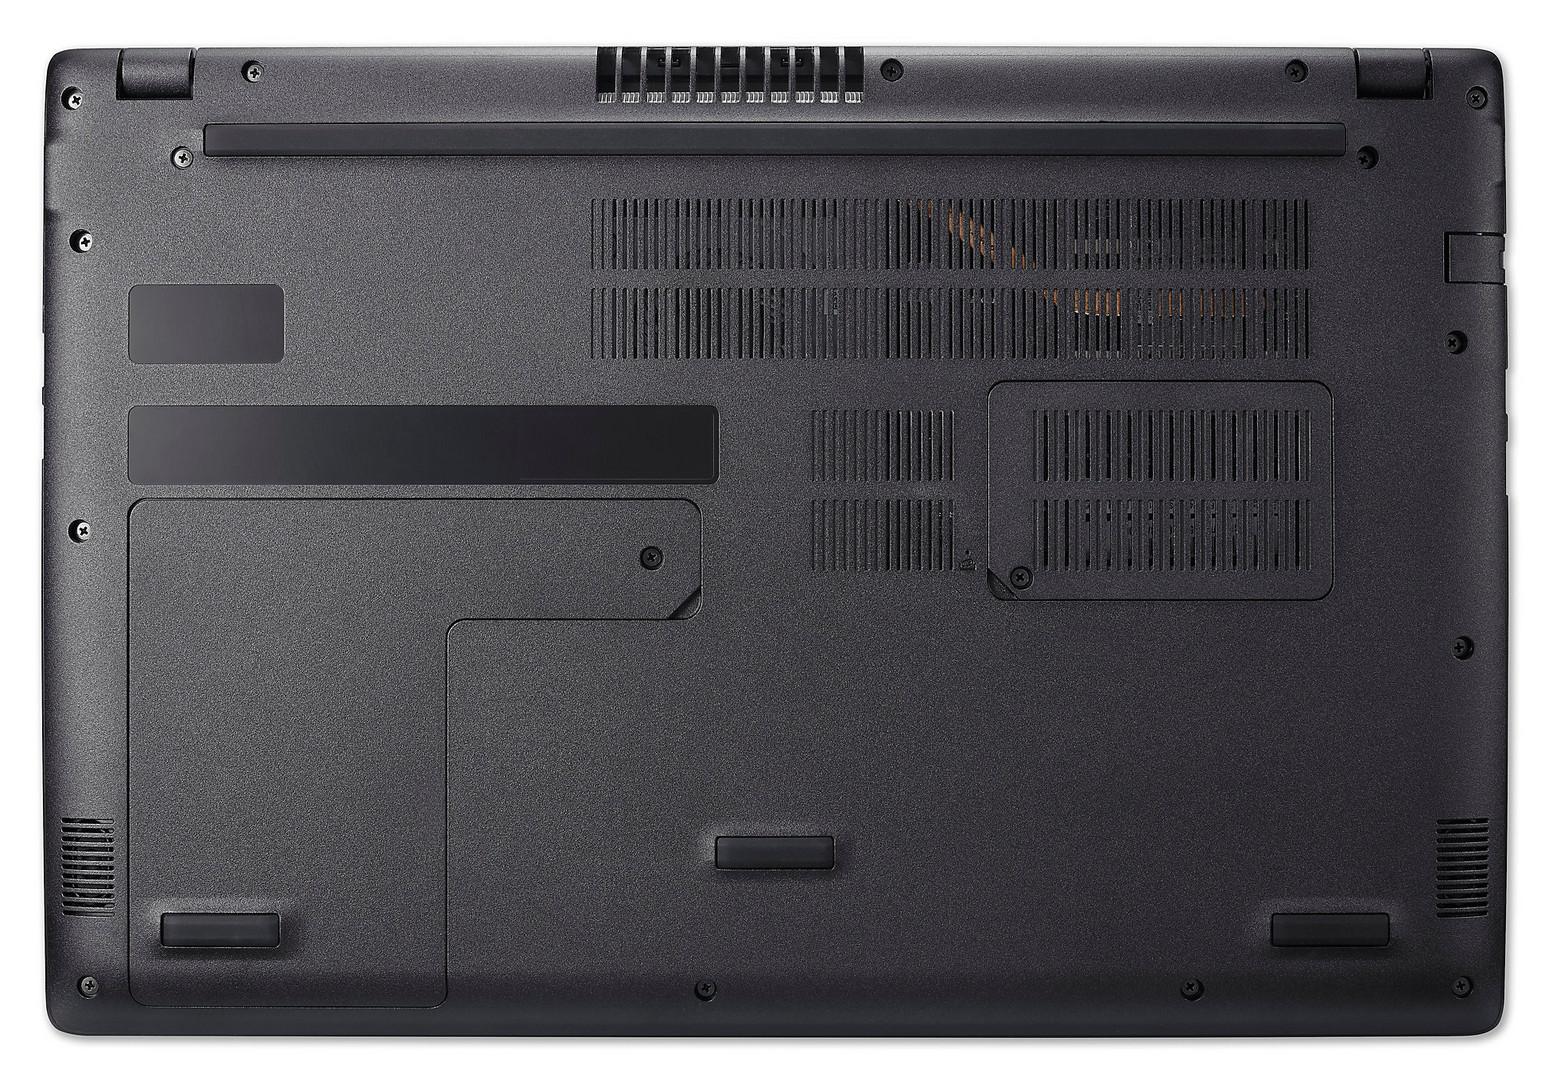 Acer Aspire 9920 TI Card Reader Driver Windows 7